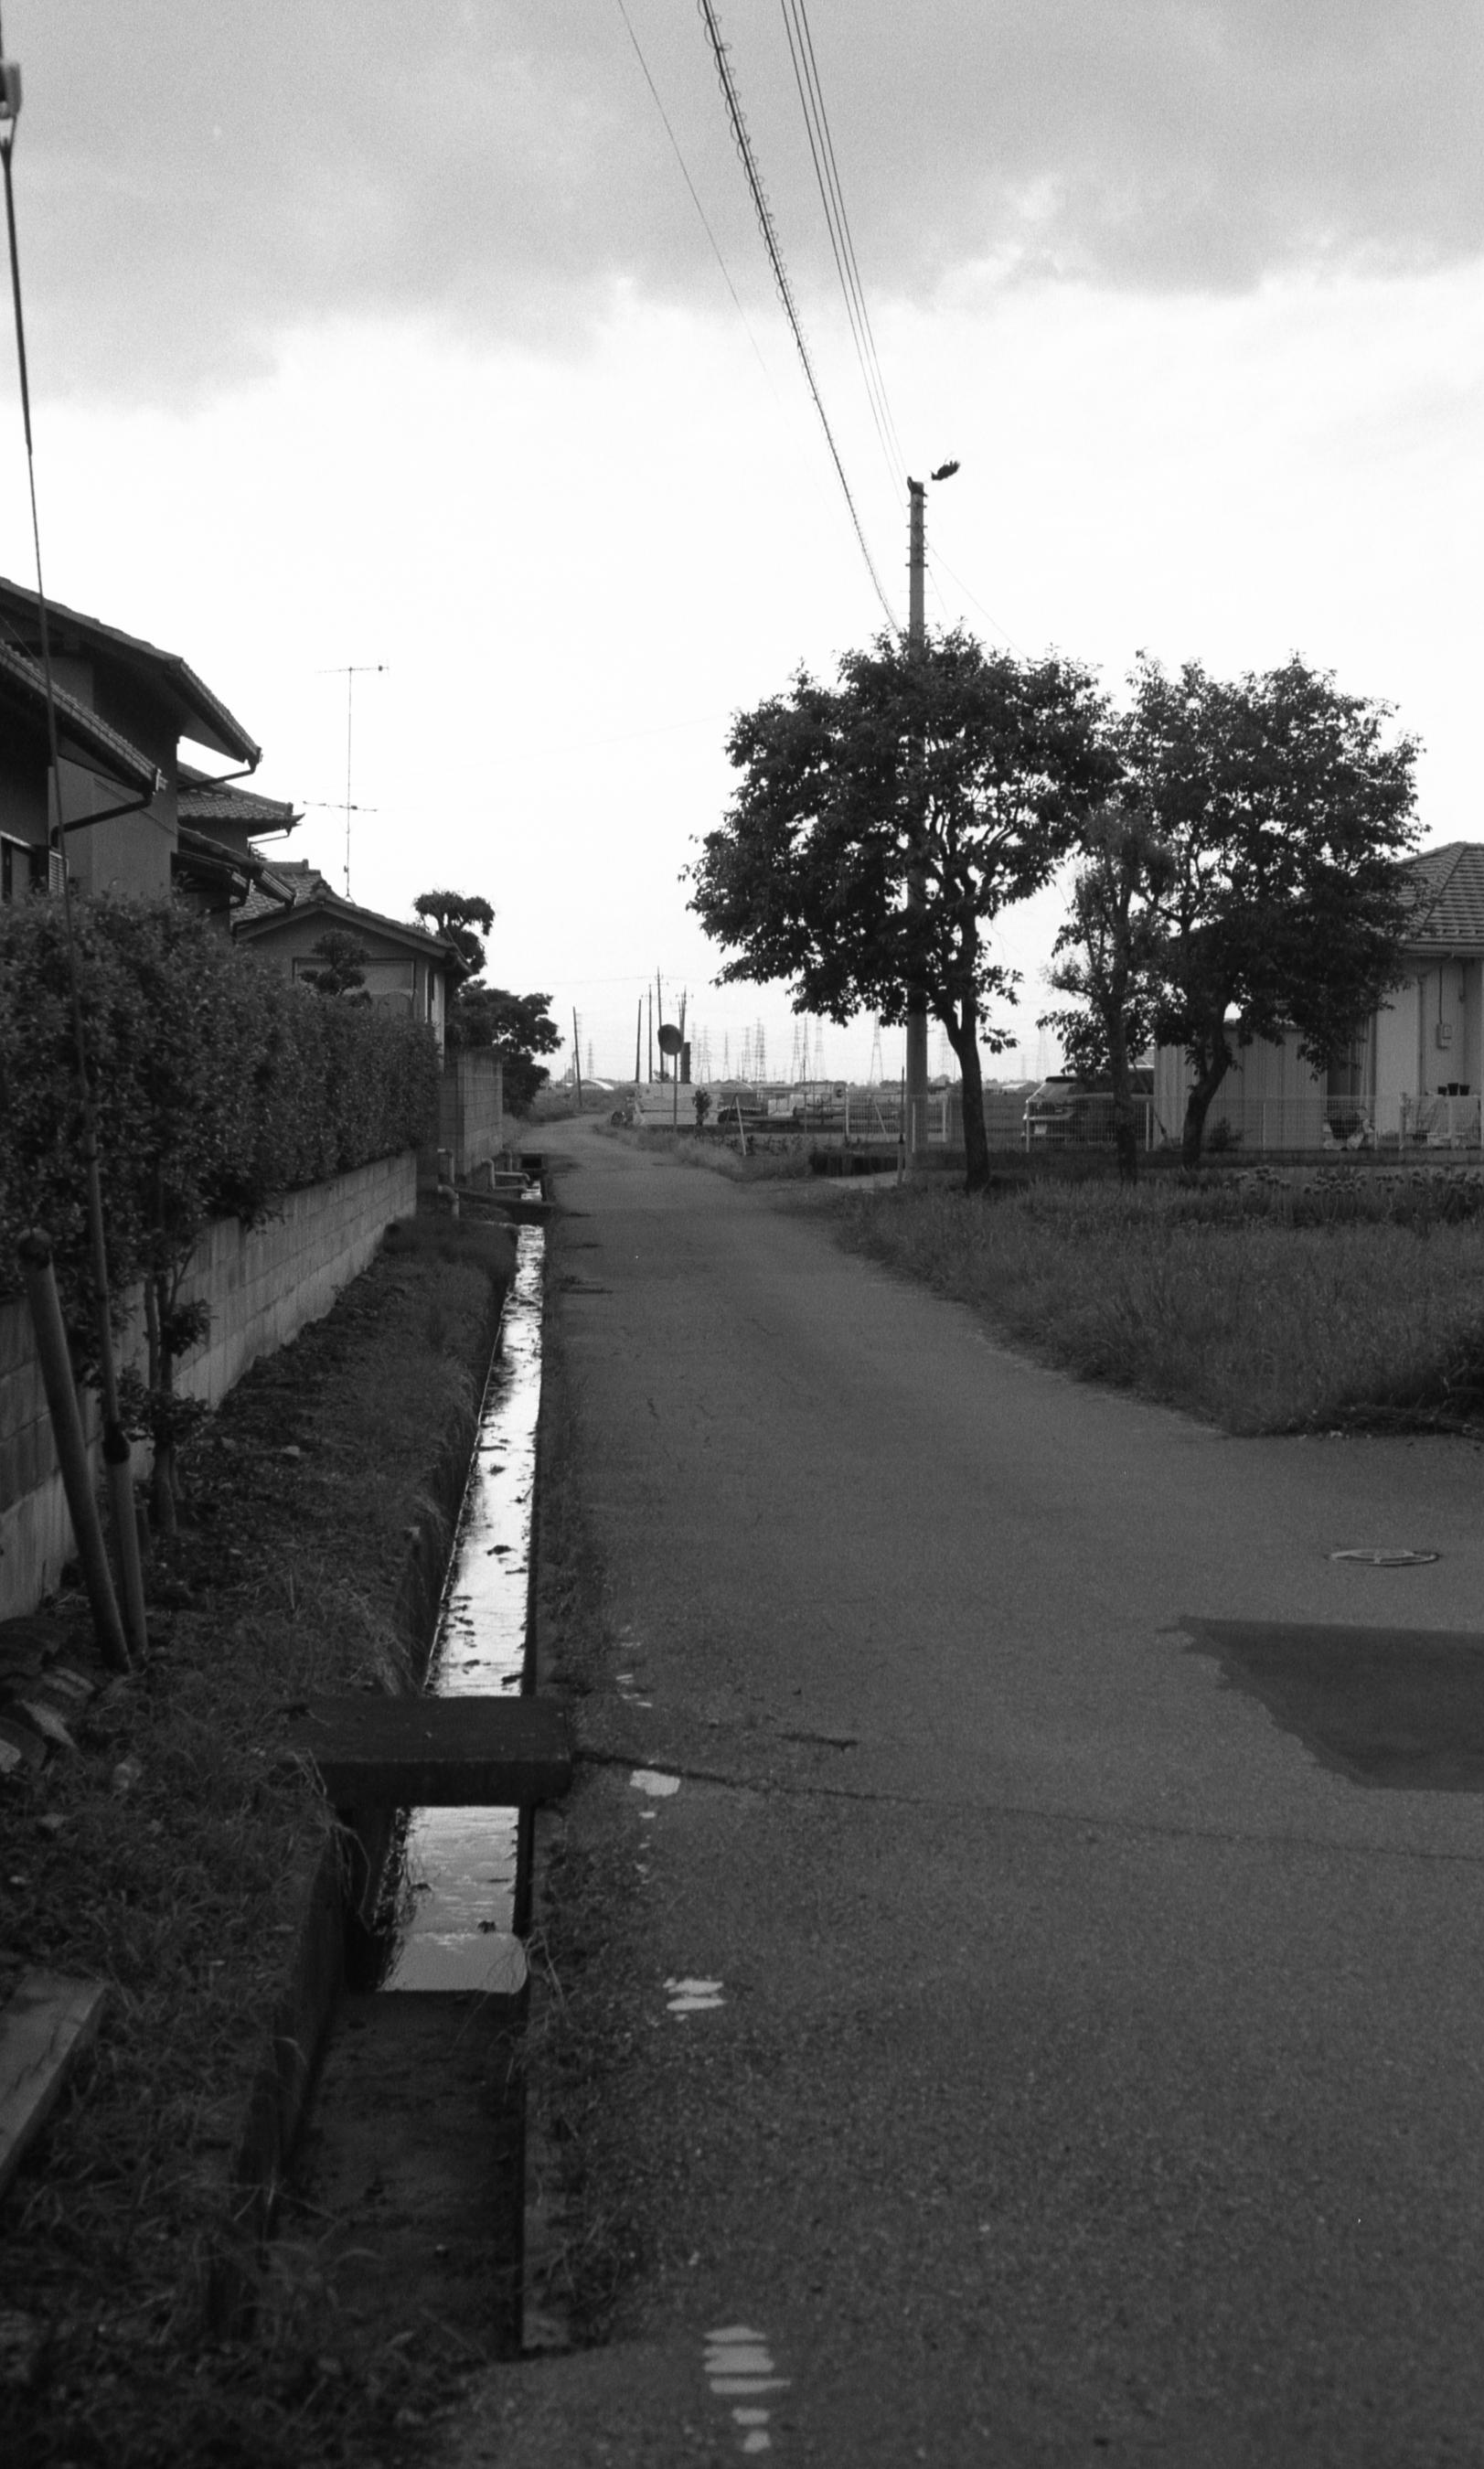 f:id:aoyama-takuro:20170626214337j:plain